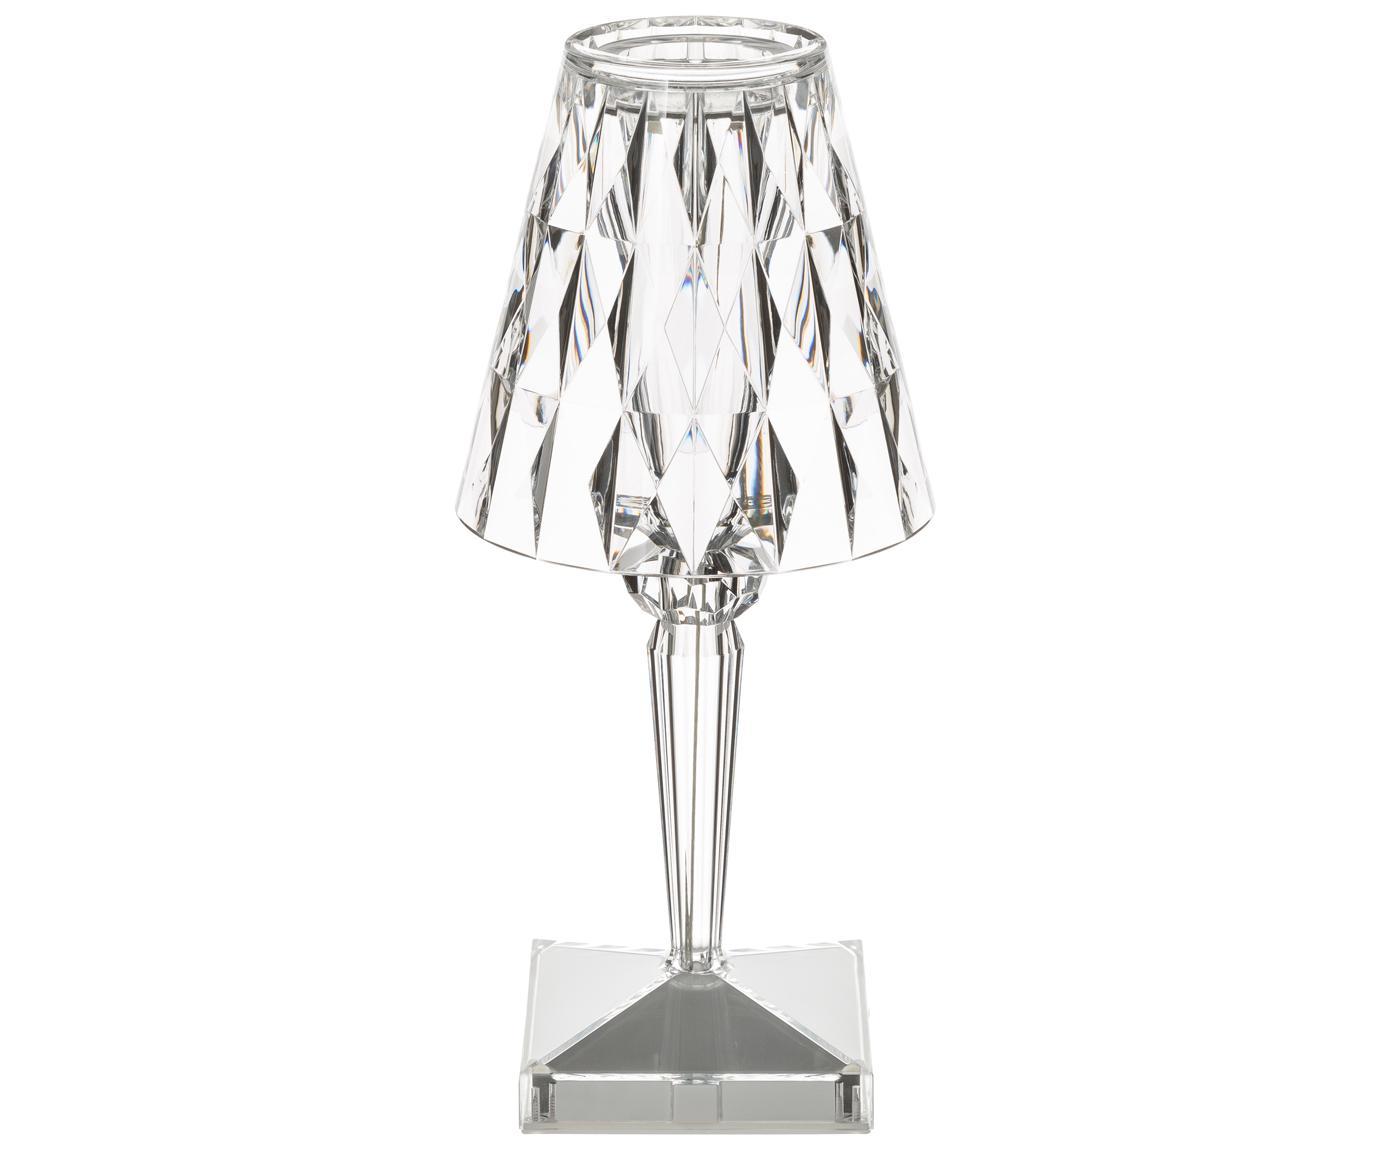 LED tafellamp Battery, Kunststof, Transparant, Ø 12 x H 26 cm